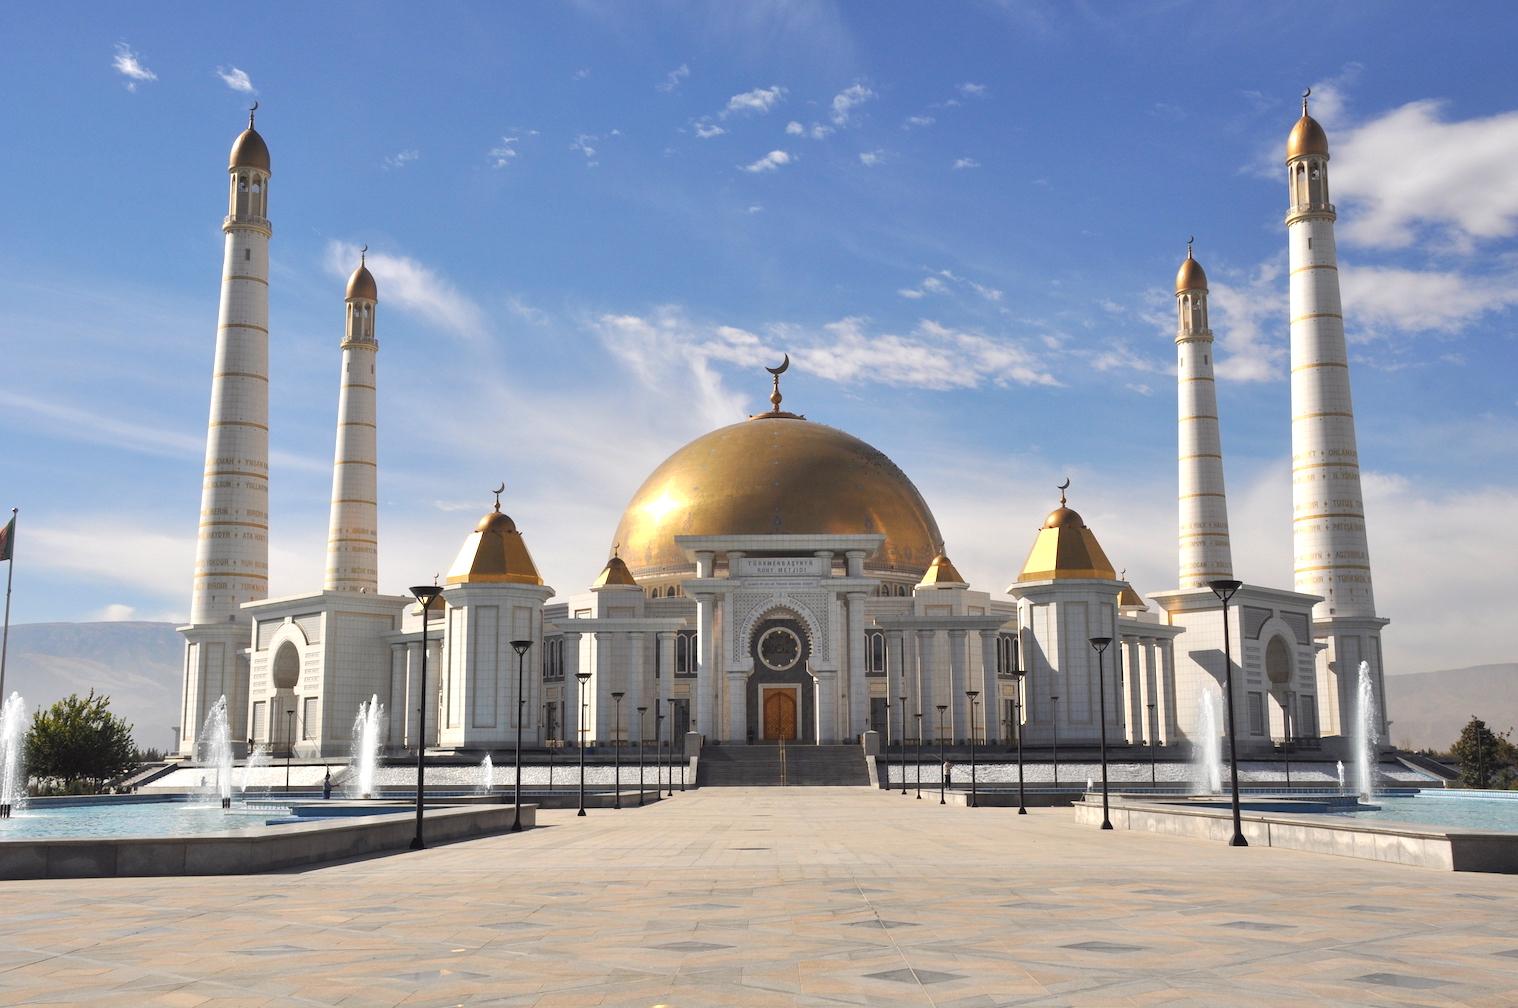 Silk Road Caspian Ashgabat Turkmenistan mosque.